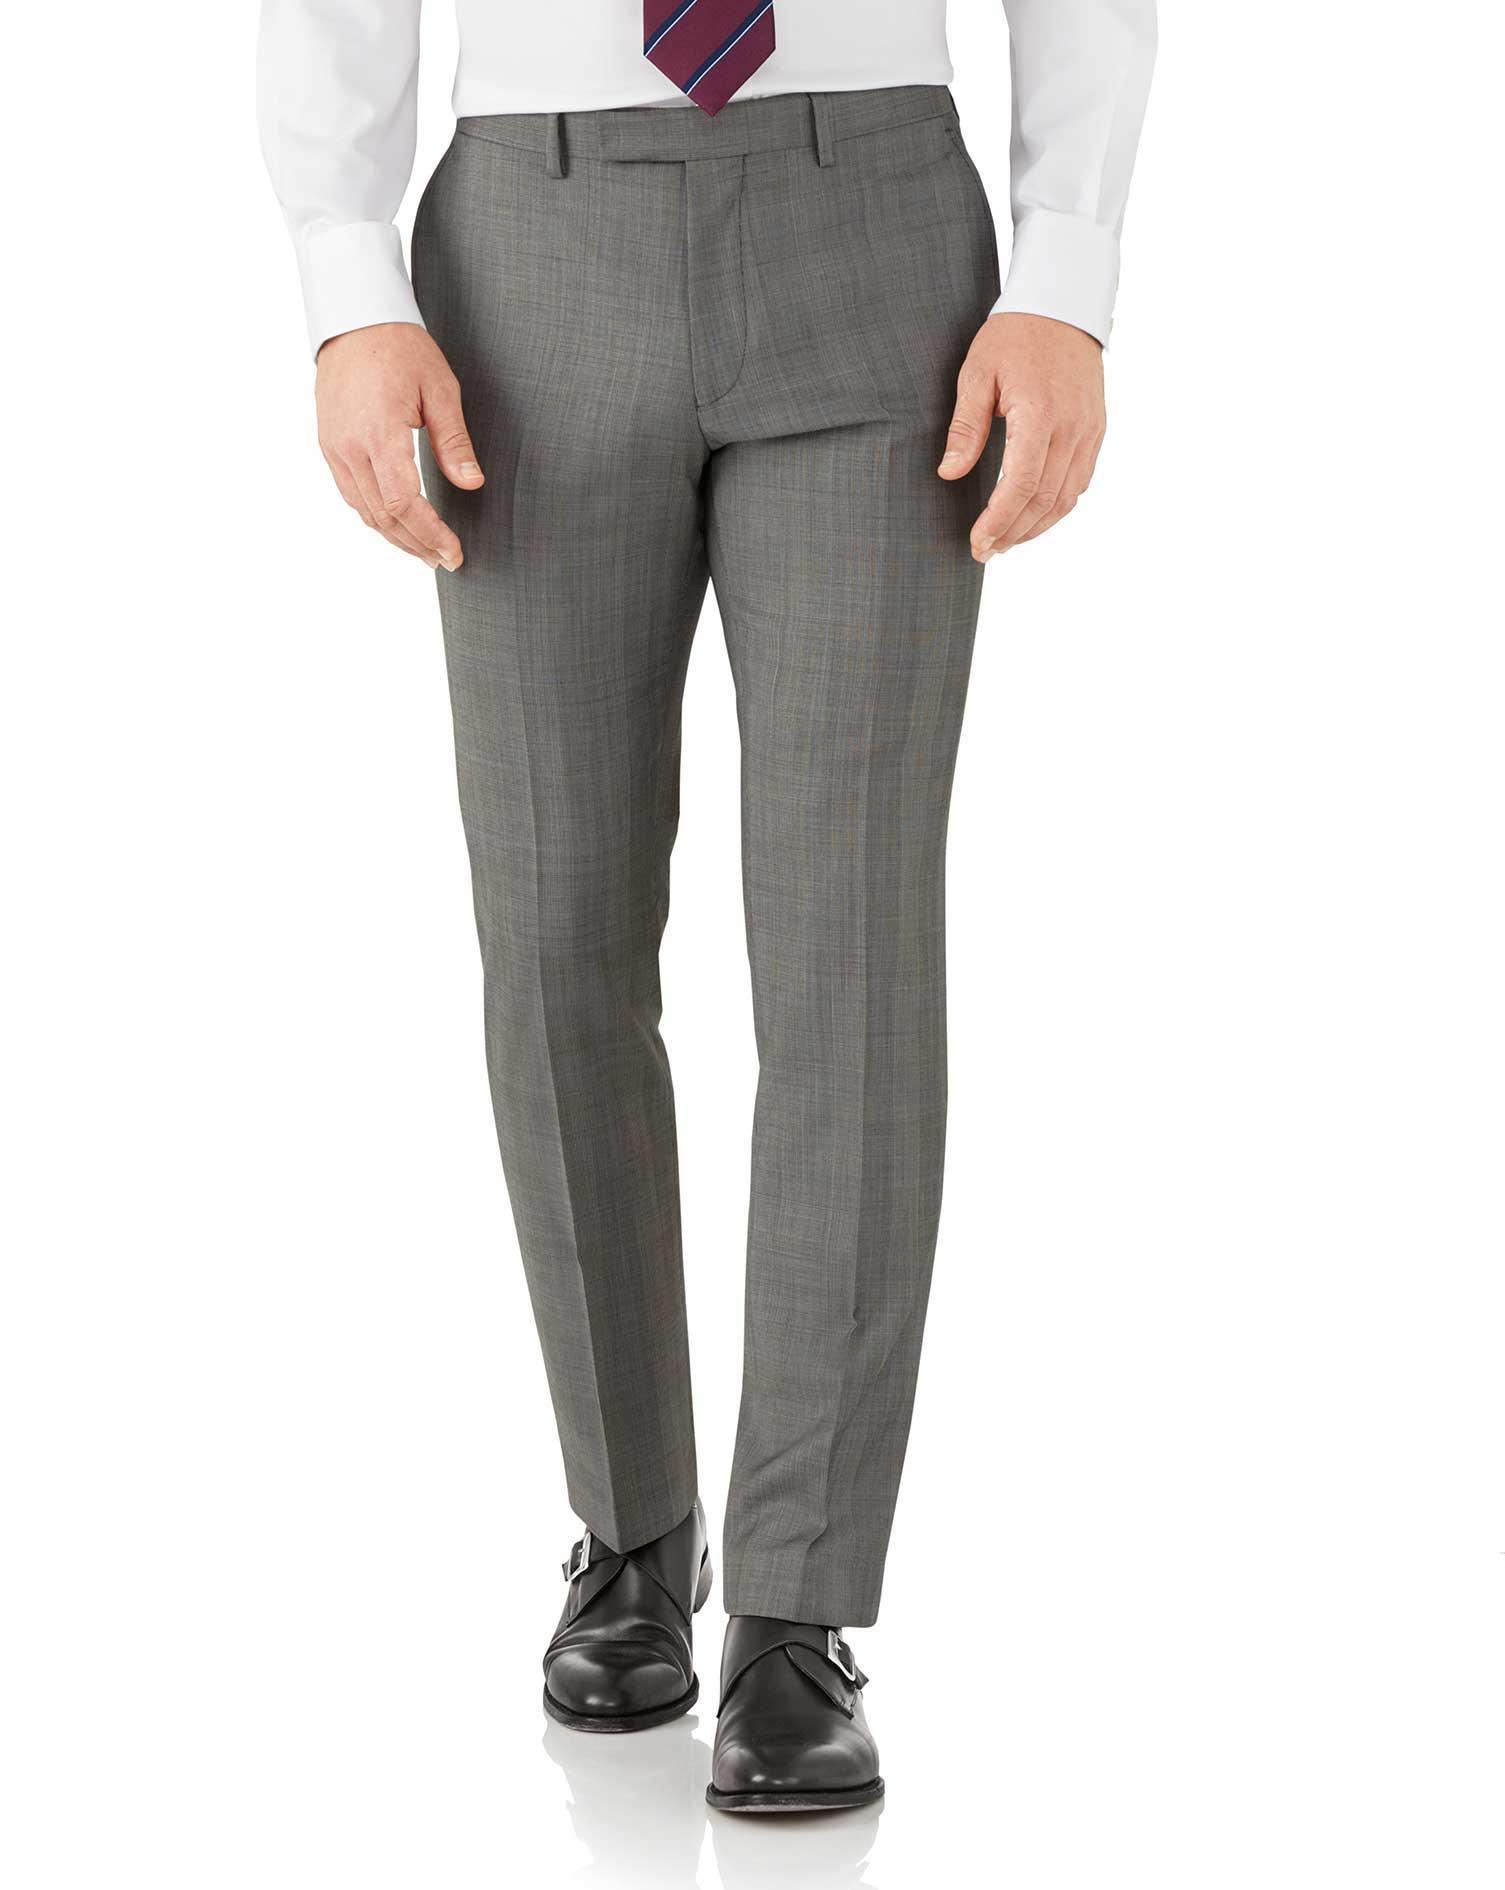 Silver Slim Fit Italian Sharkskin Luxury Check Suit Trousers Size W36 L38 by Charles Tyrwhitt